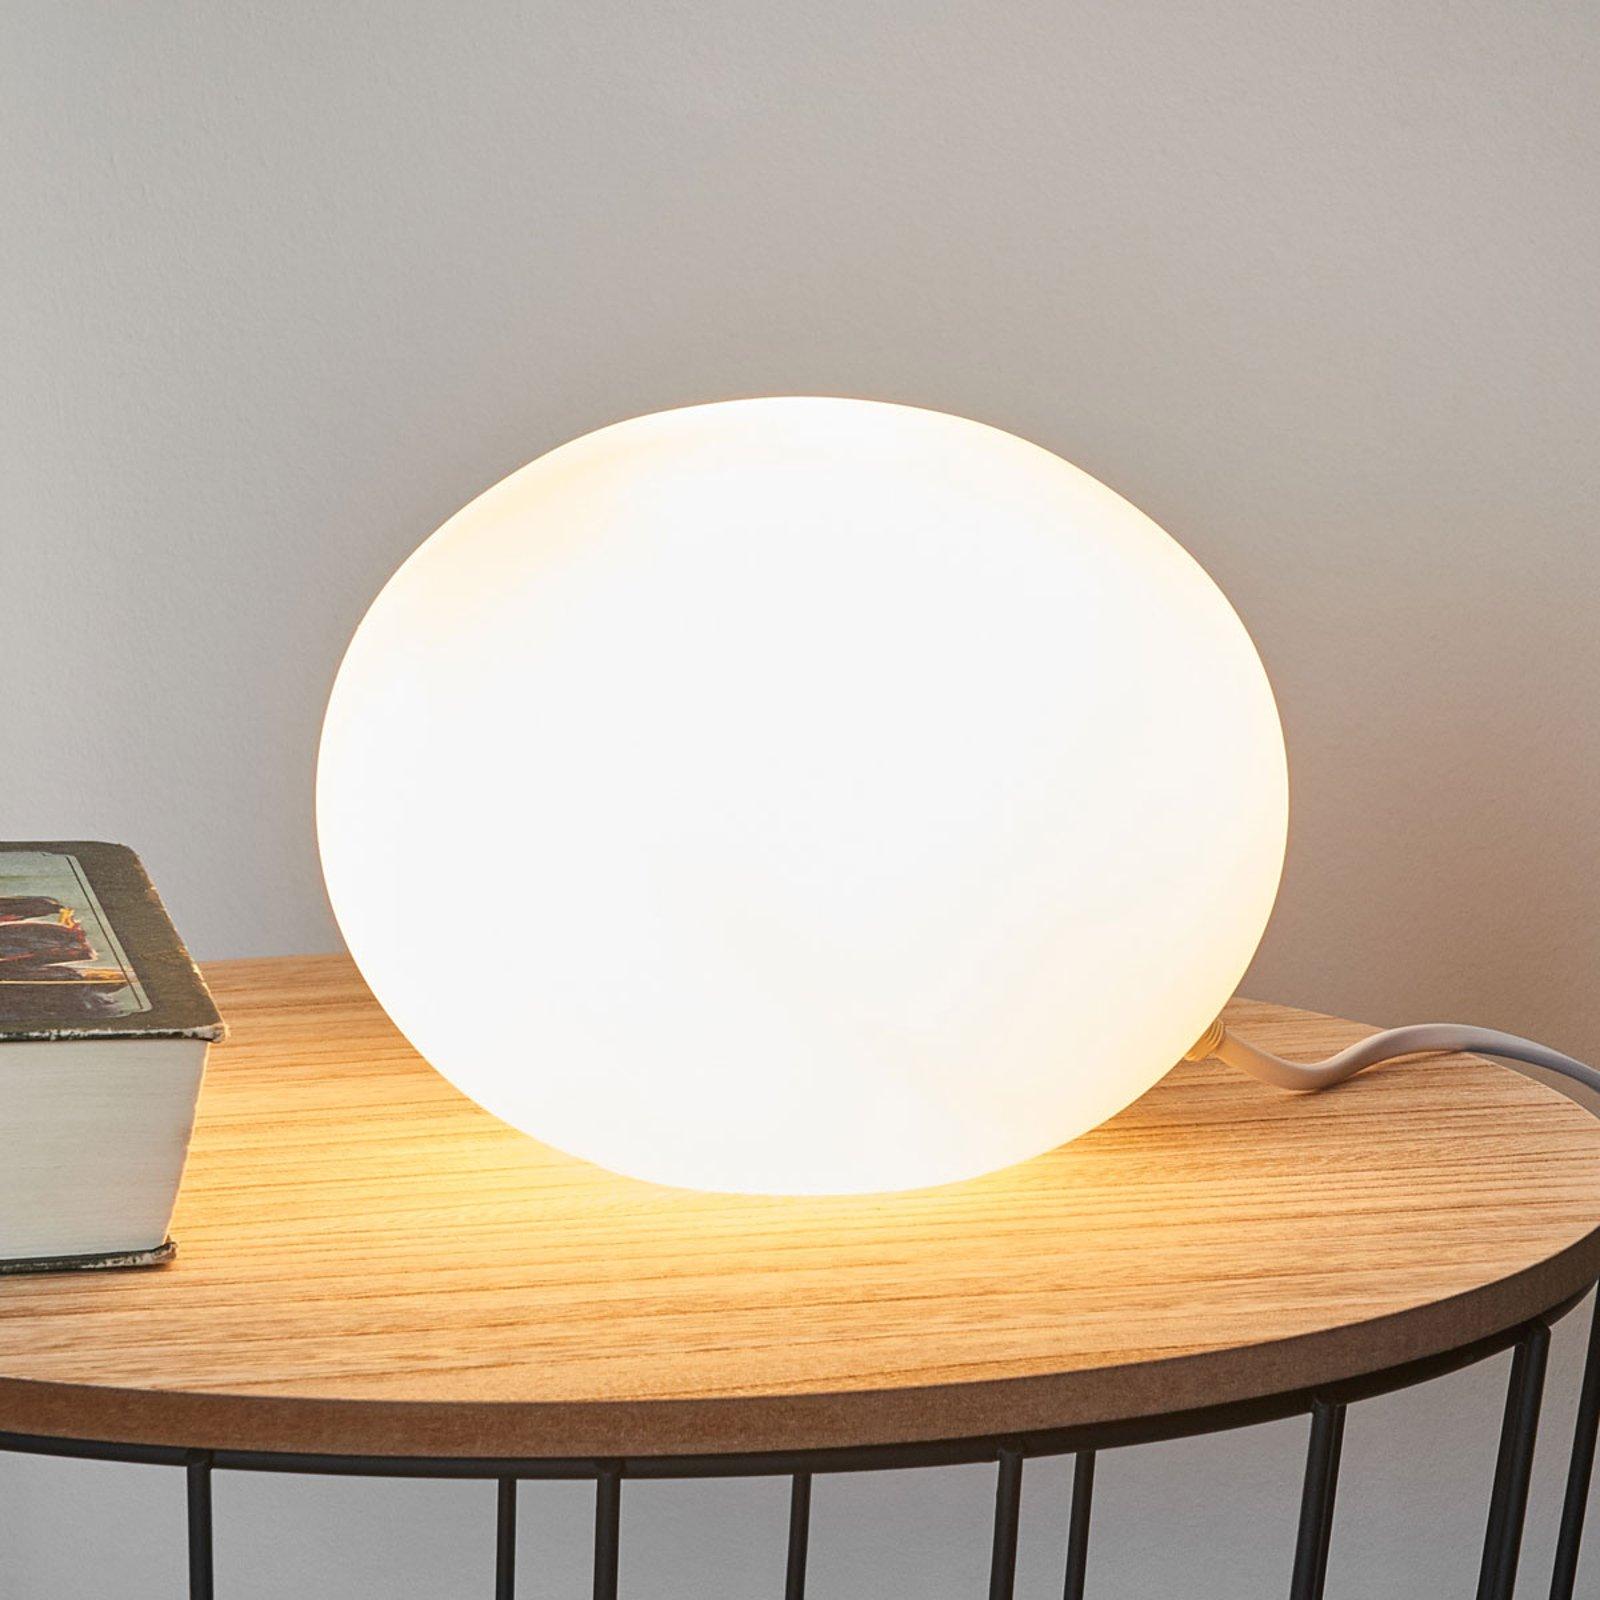 Dekorativ bordlampe Glass Oval Ø 18 cm